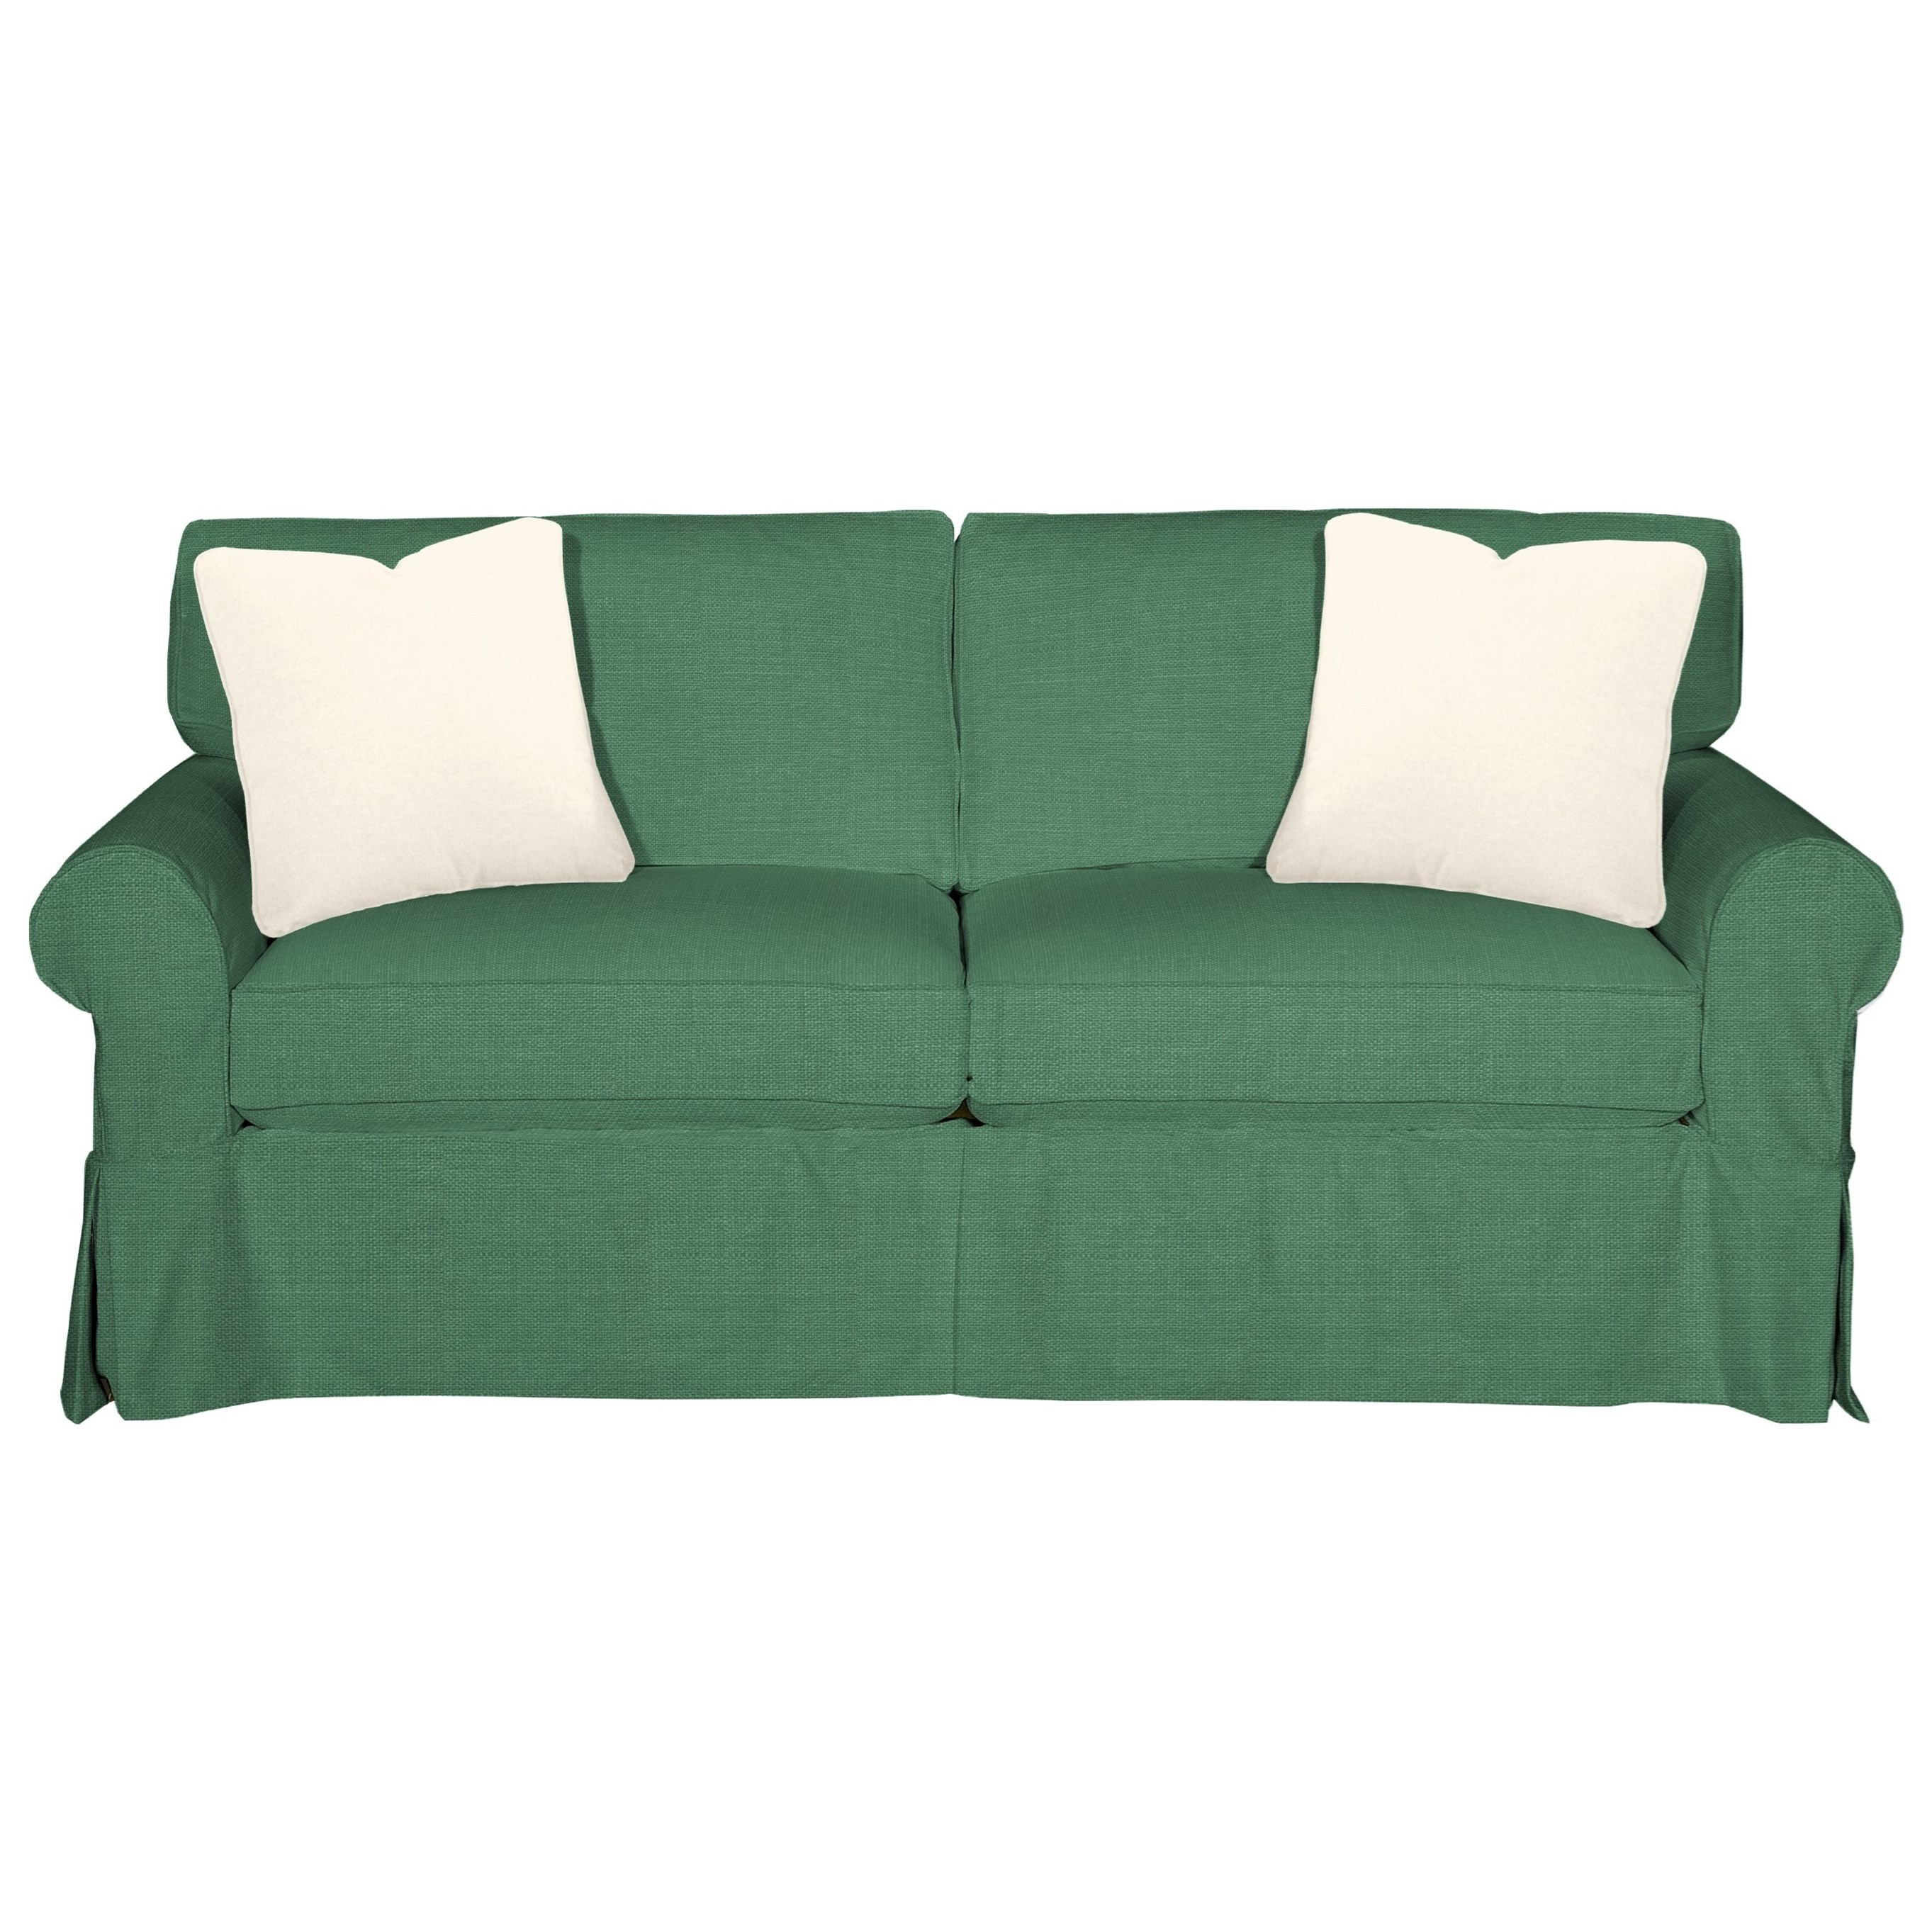 9228 Sleeper Sofa w/ Innerspring Mattress by Craftmaster at Dunk & Bright Furniture